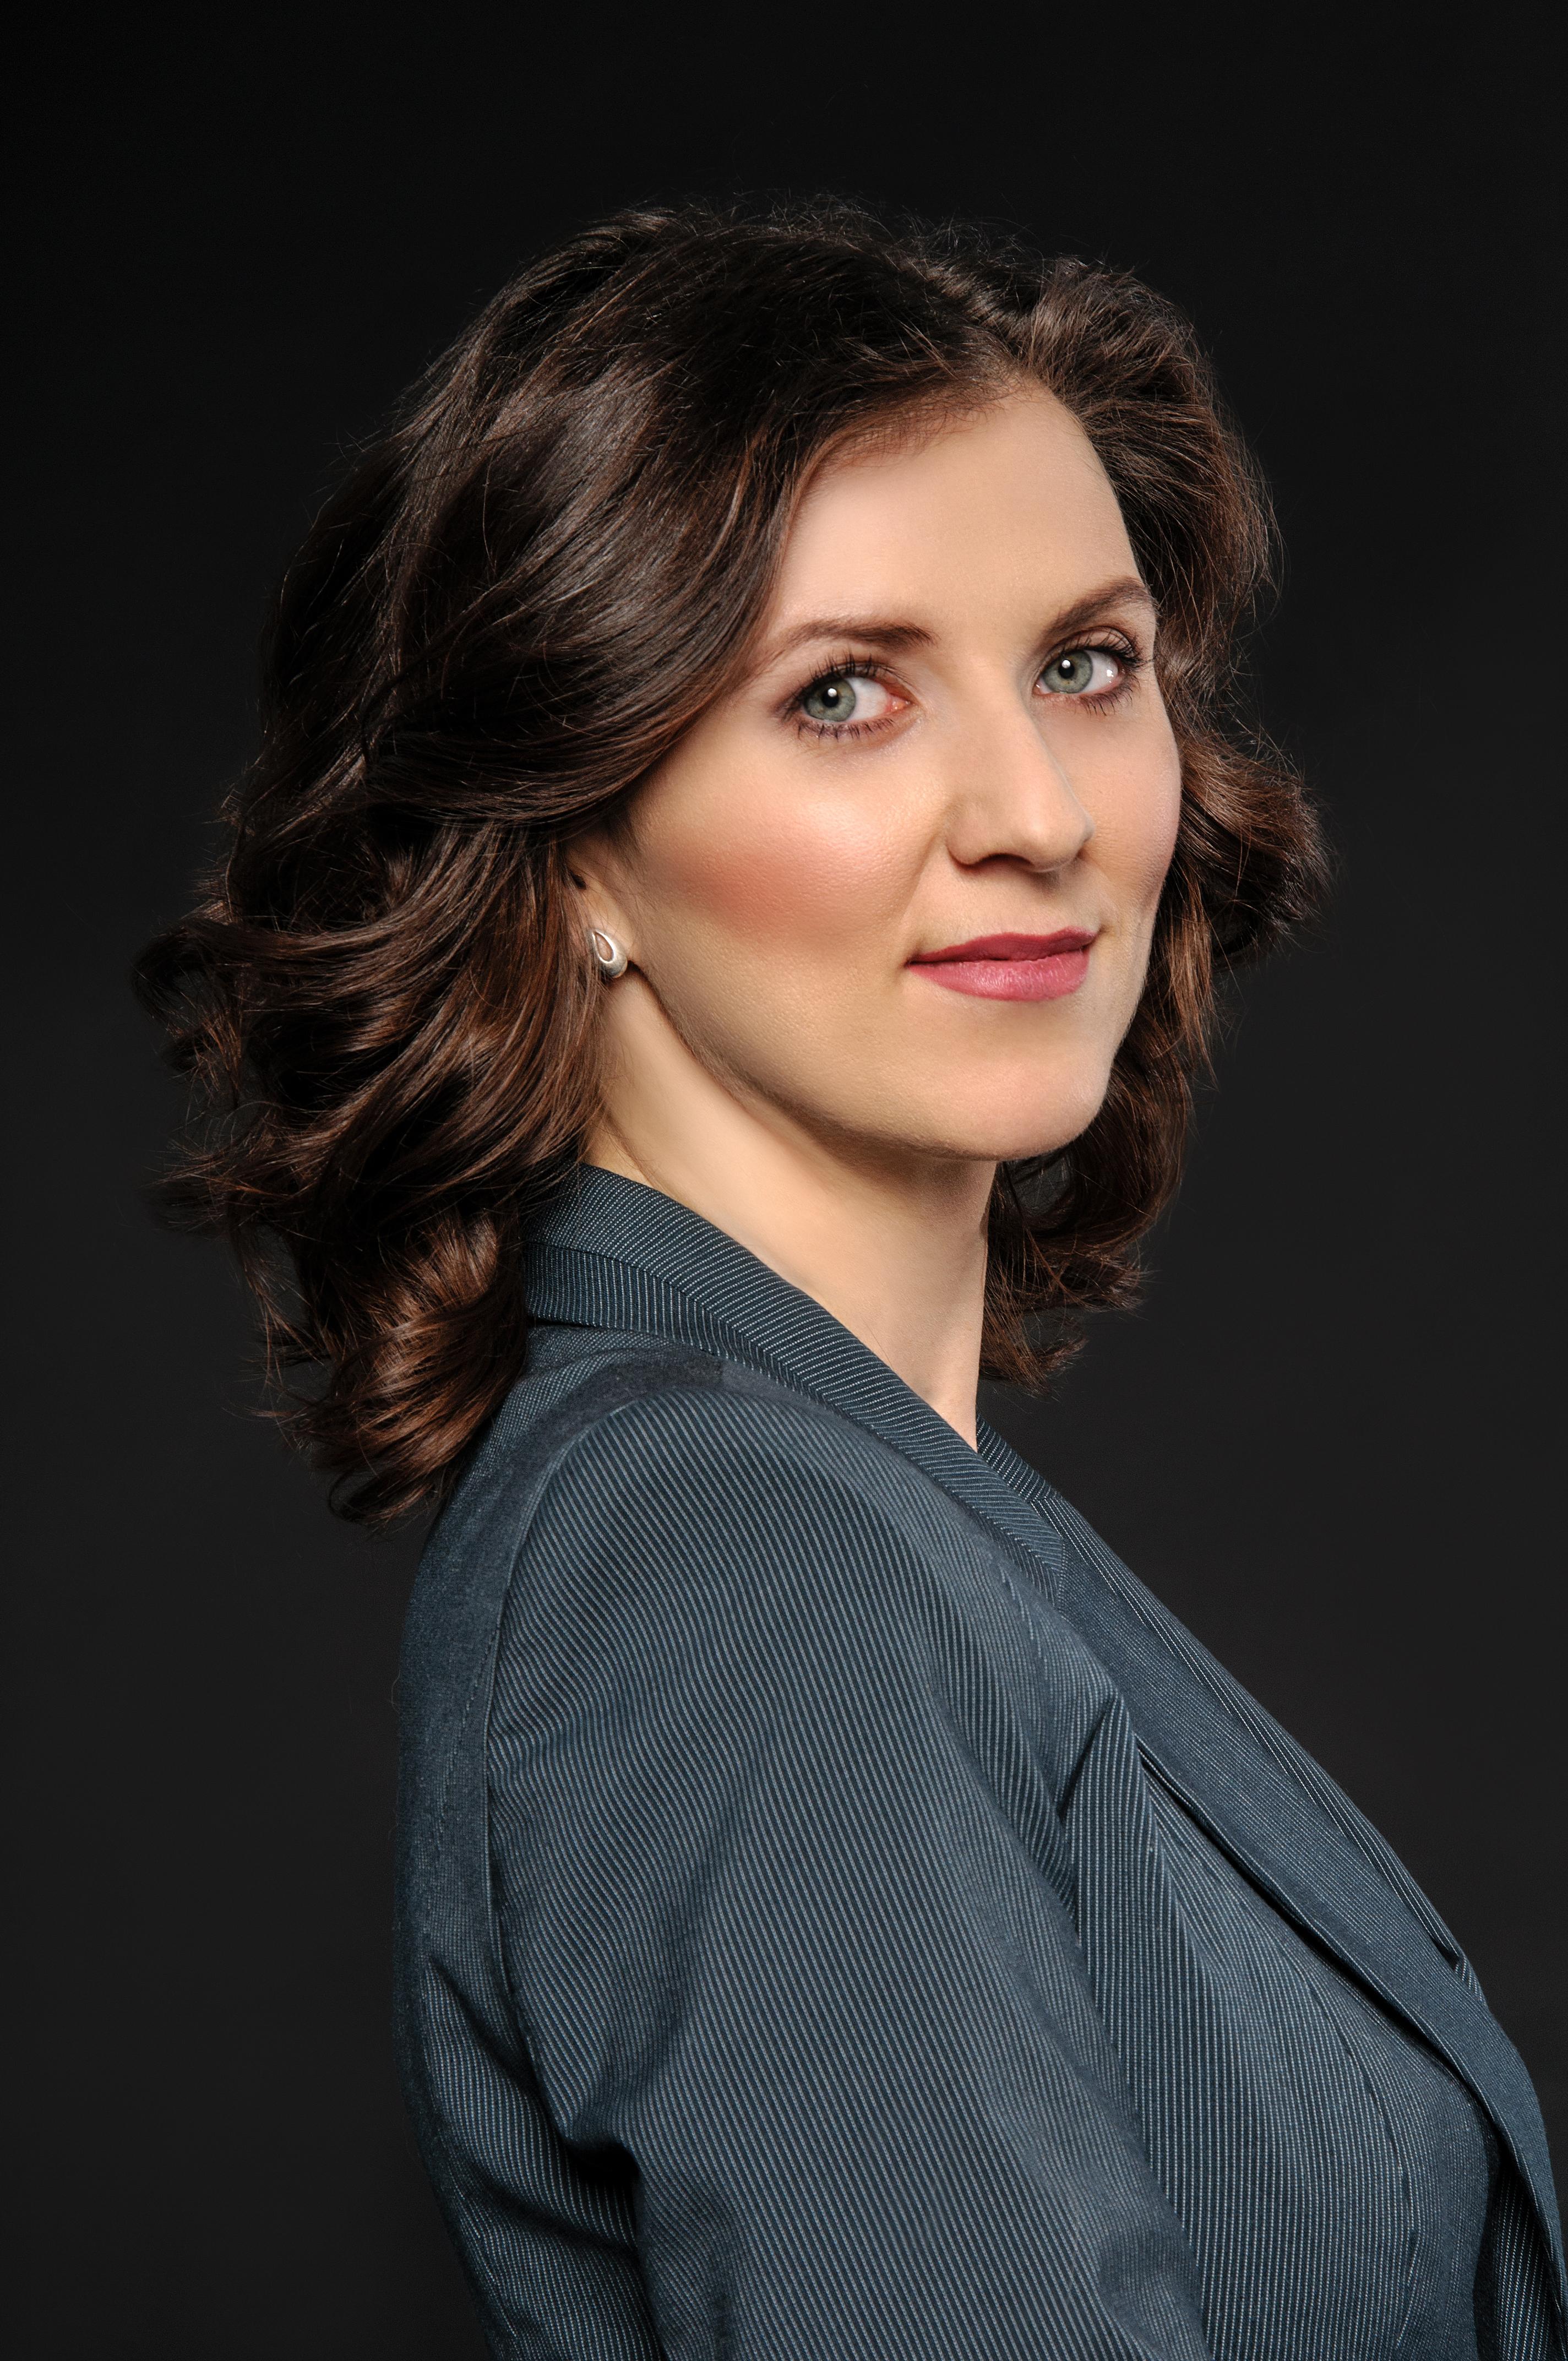 hipoalergiczni-Agnieszka-Szpaderska-dyrektor-WorldFood-Poland-portret